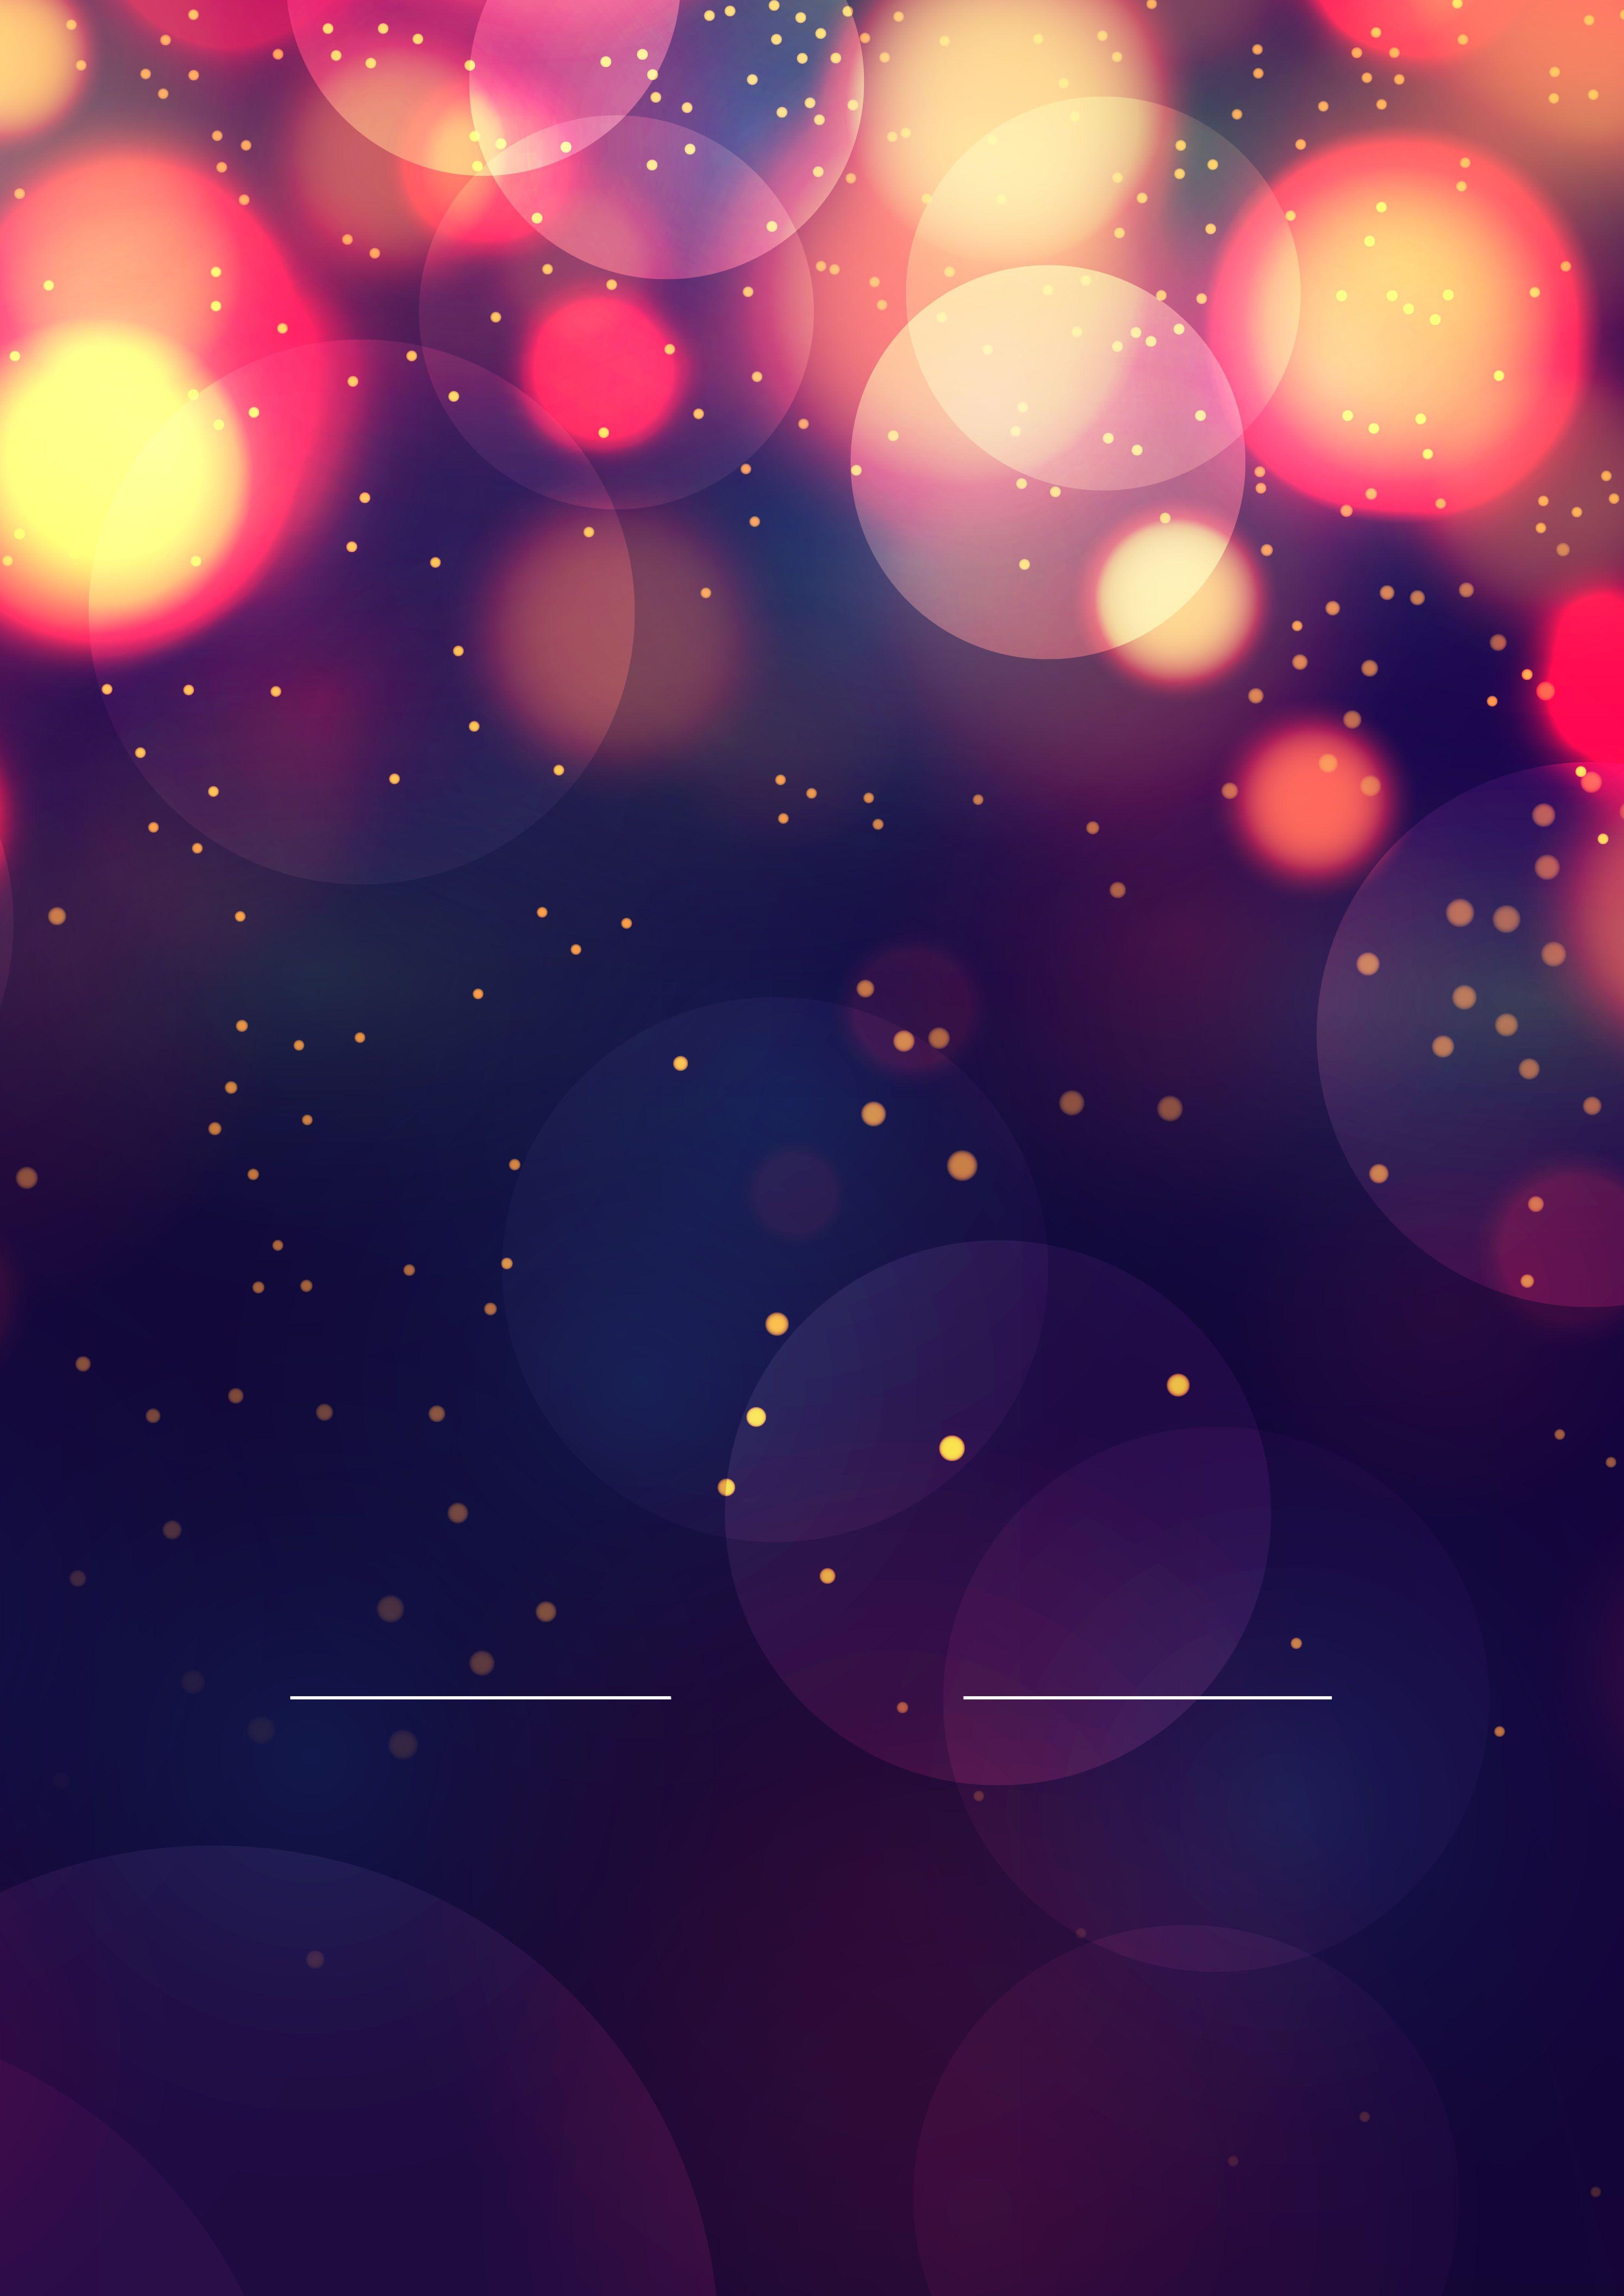 Dream Night Light Effect Background | Adobe photoshop cs3 in